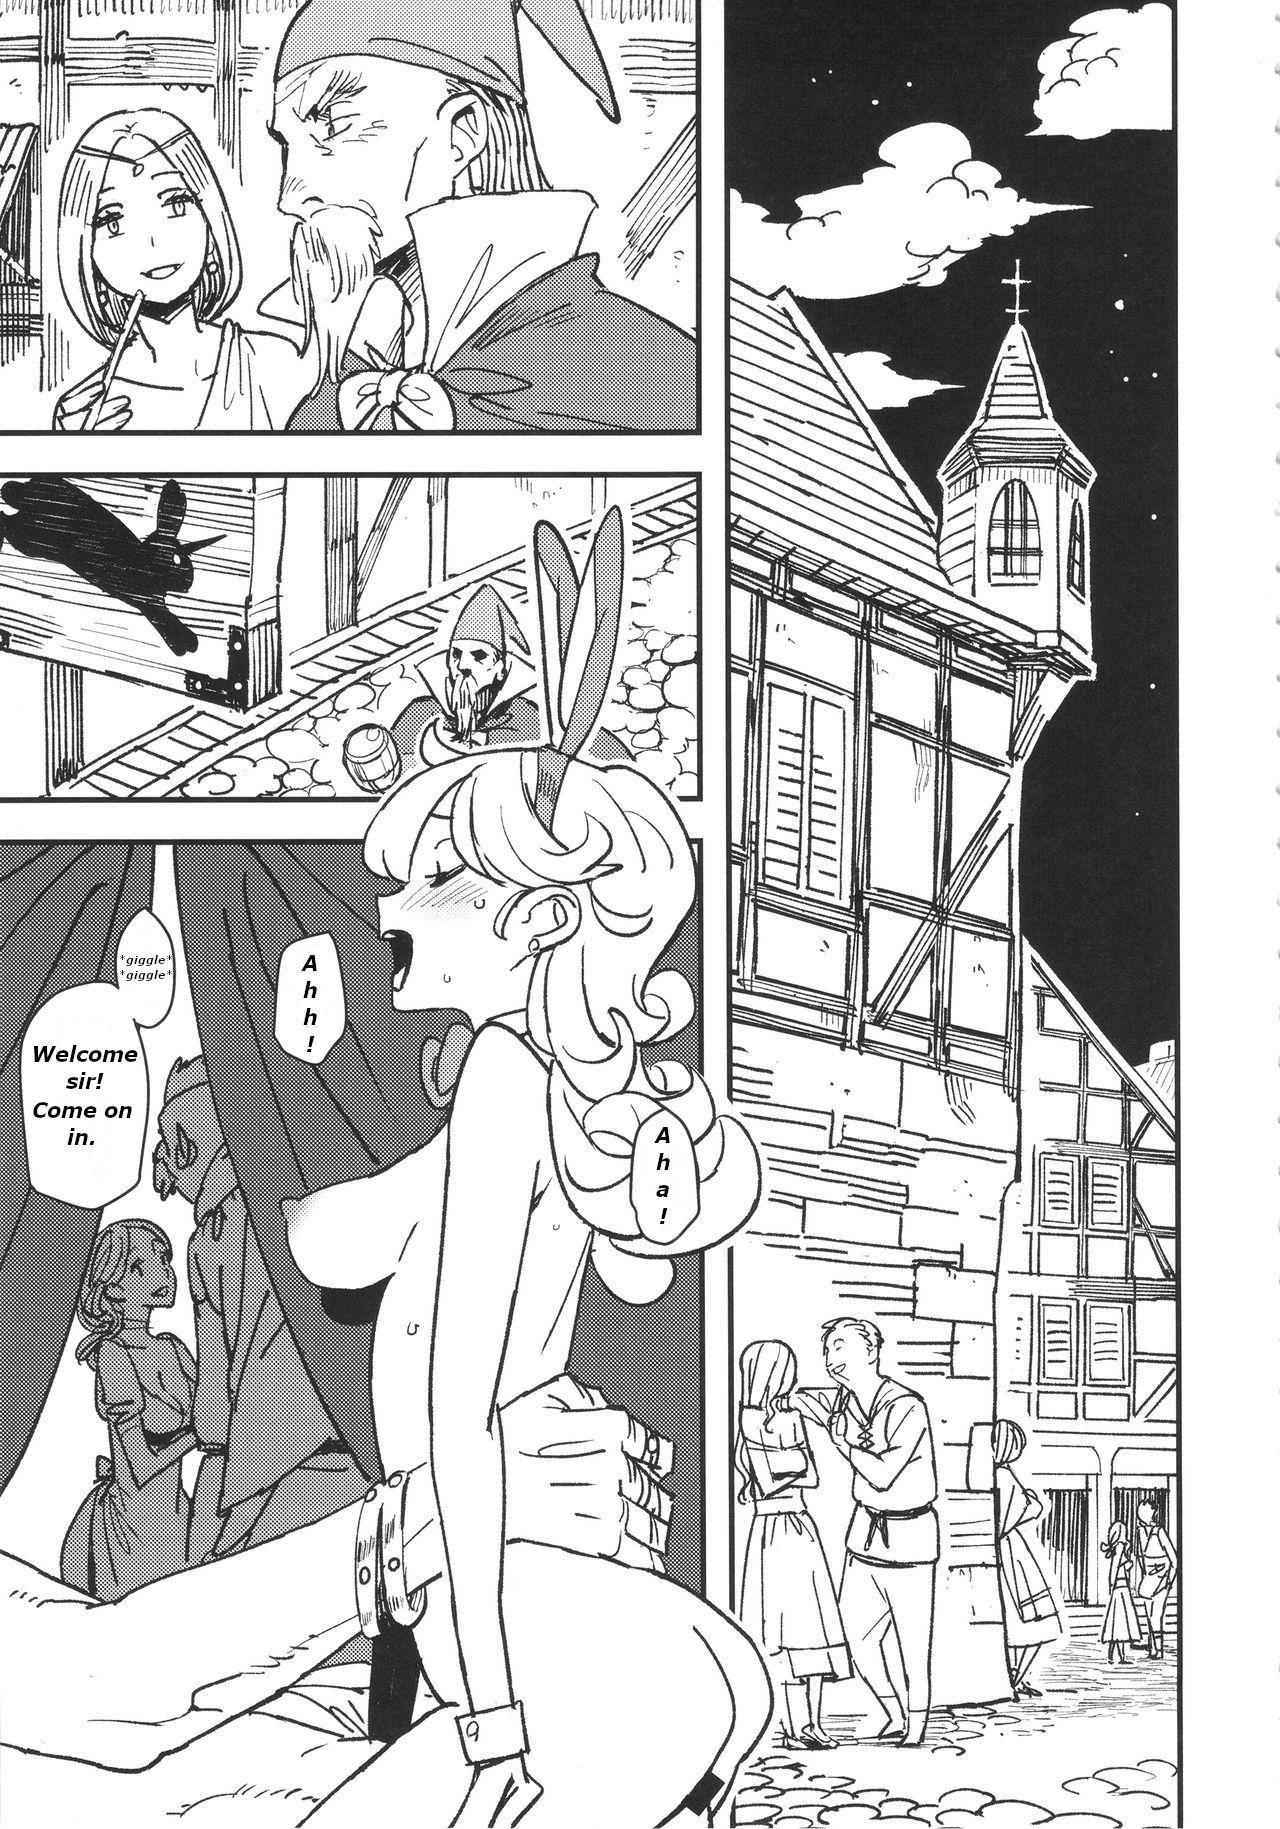 Yadoya no Kemono - Beast of inn | Good for Nothing 1